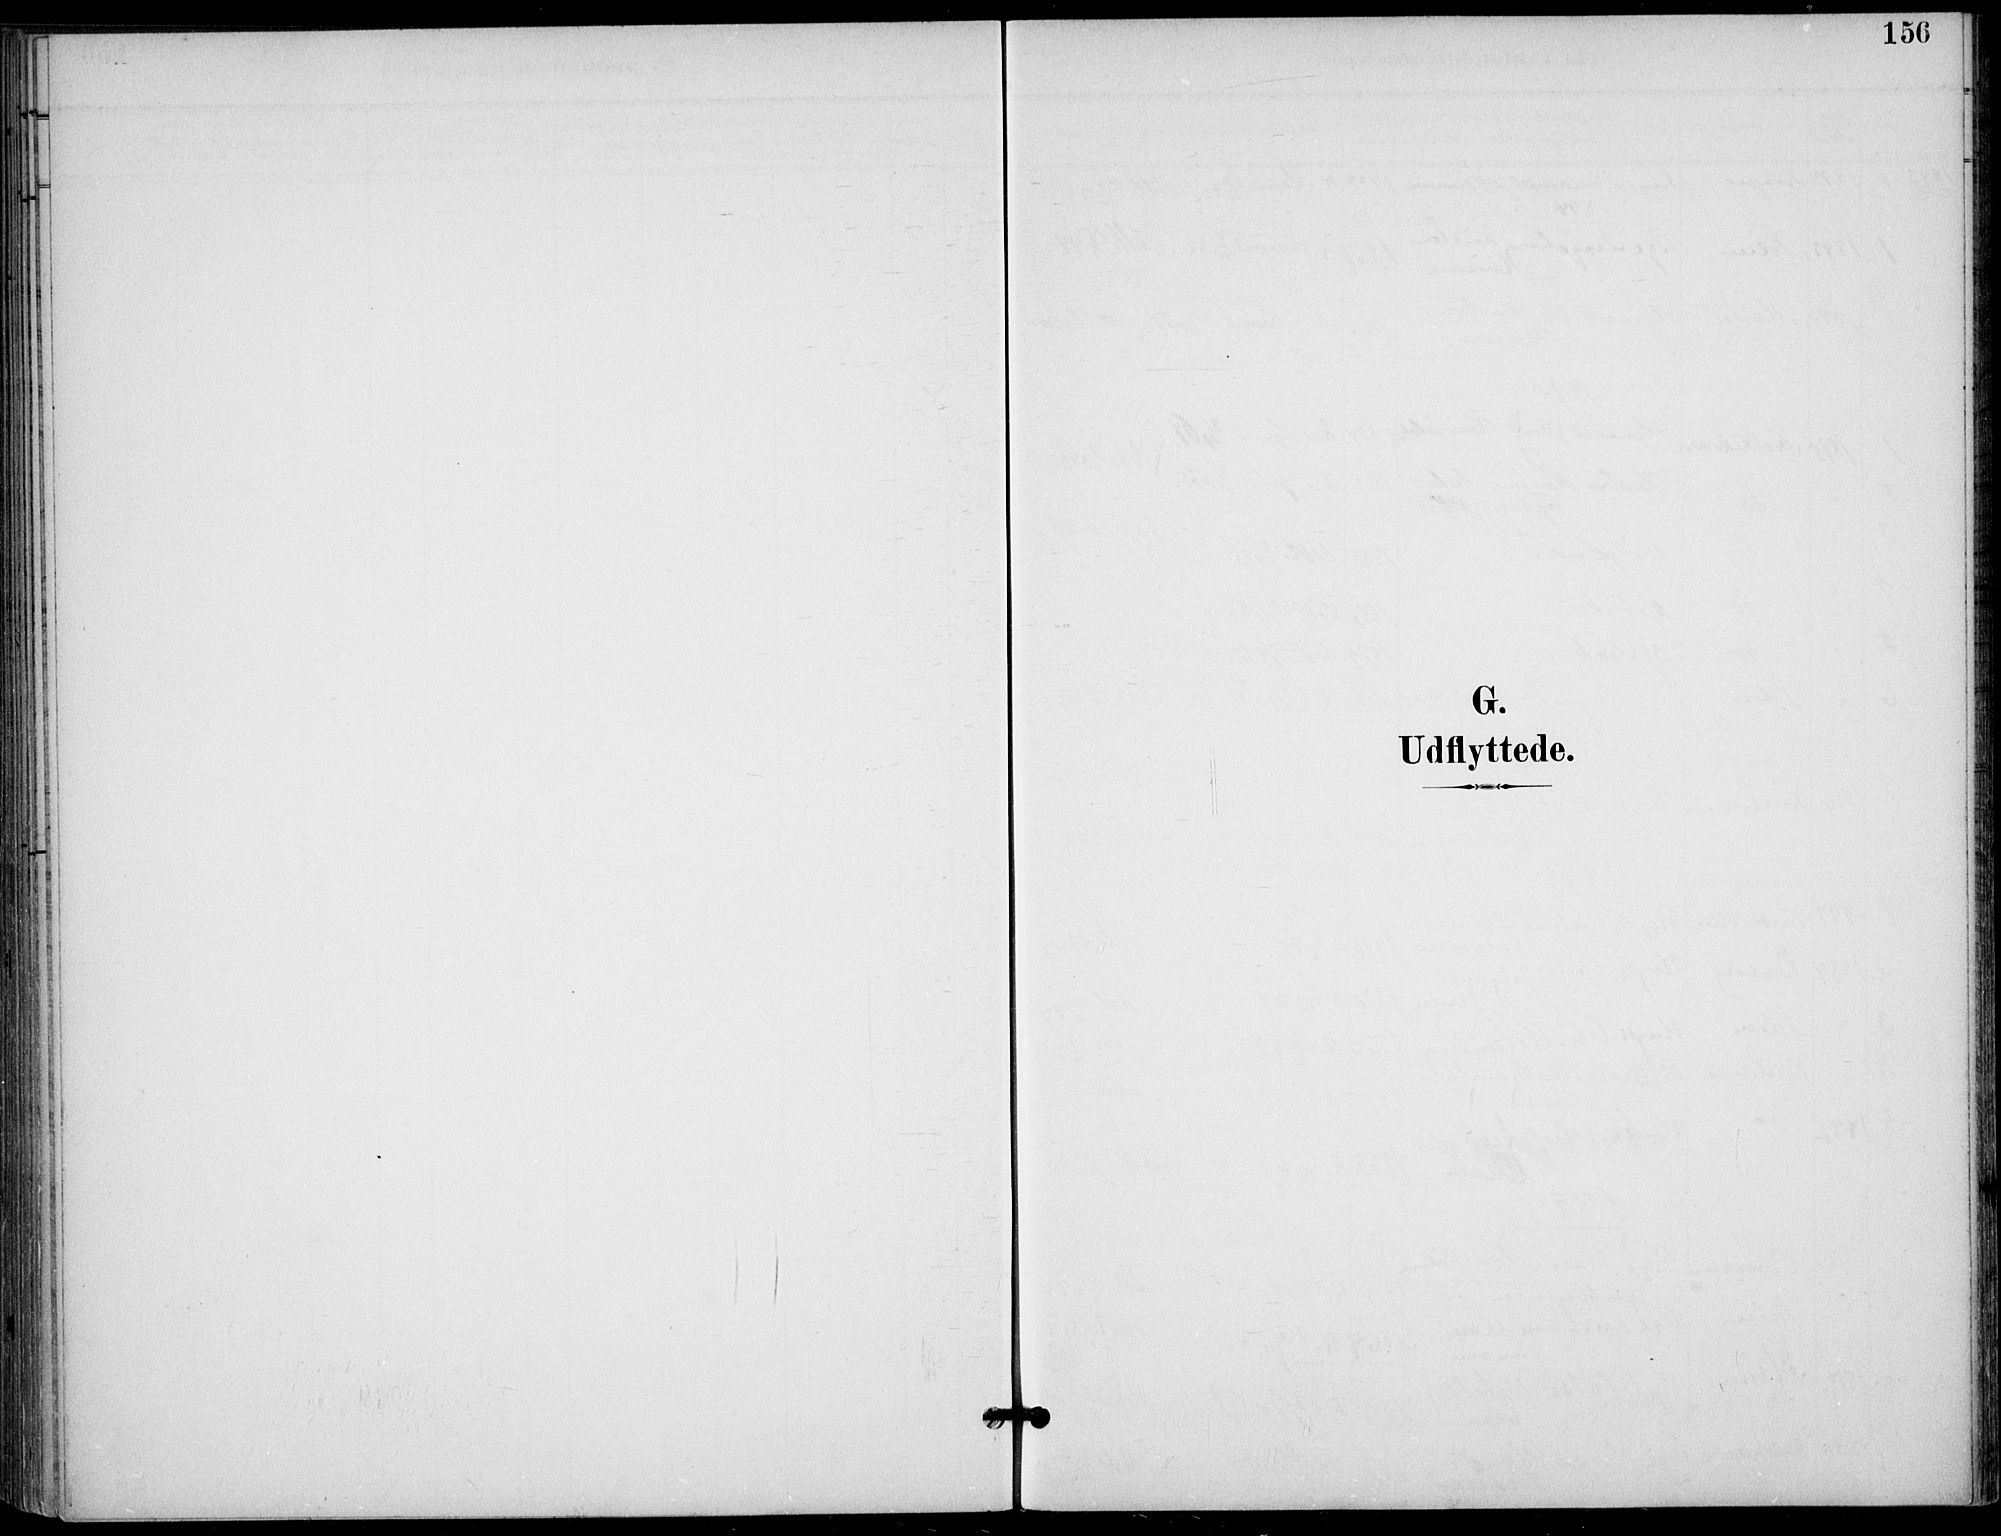 SAKO, Langesund kirkebøker, F/Fa/L0003: Ministerialbok nr. 3, 1893-1907, s. 156